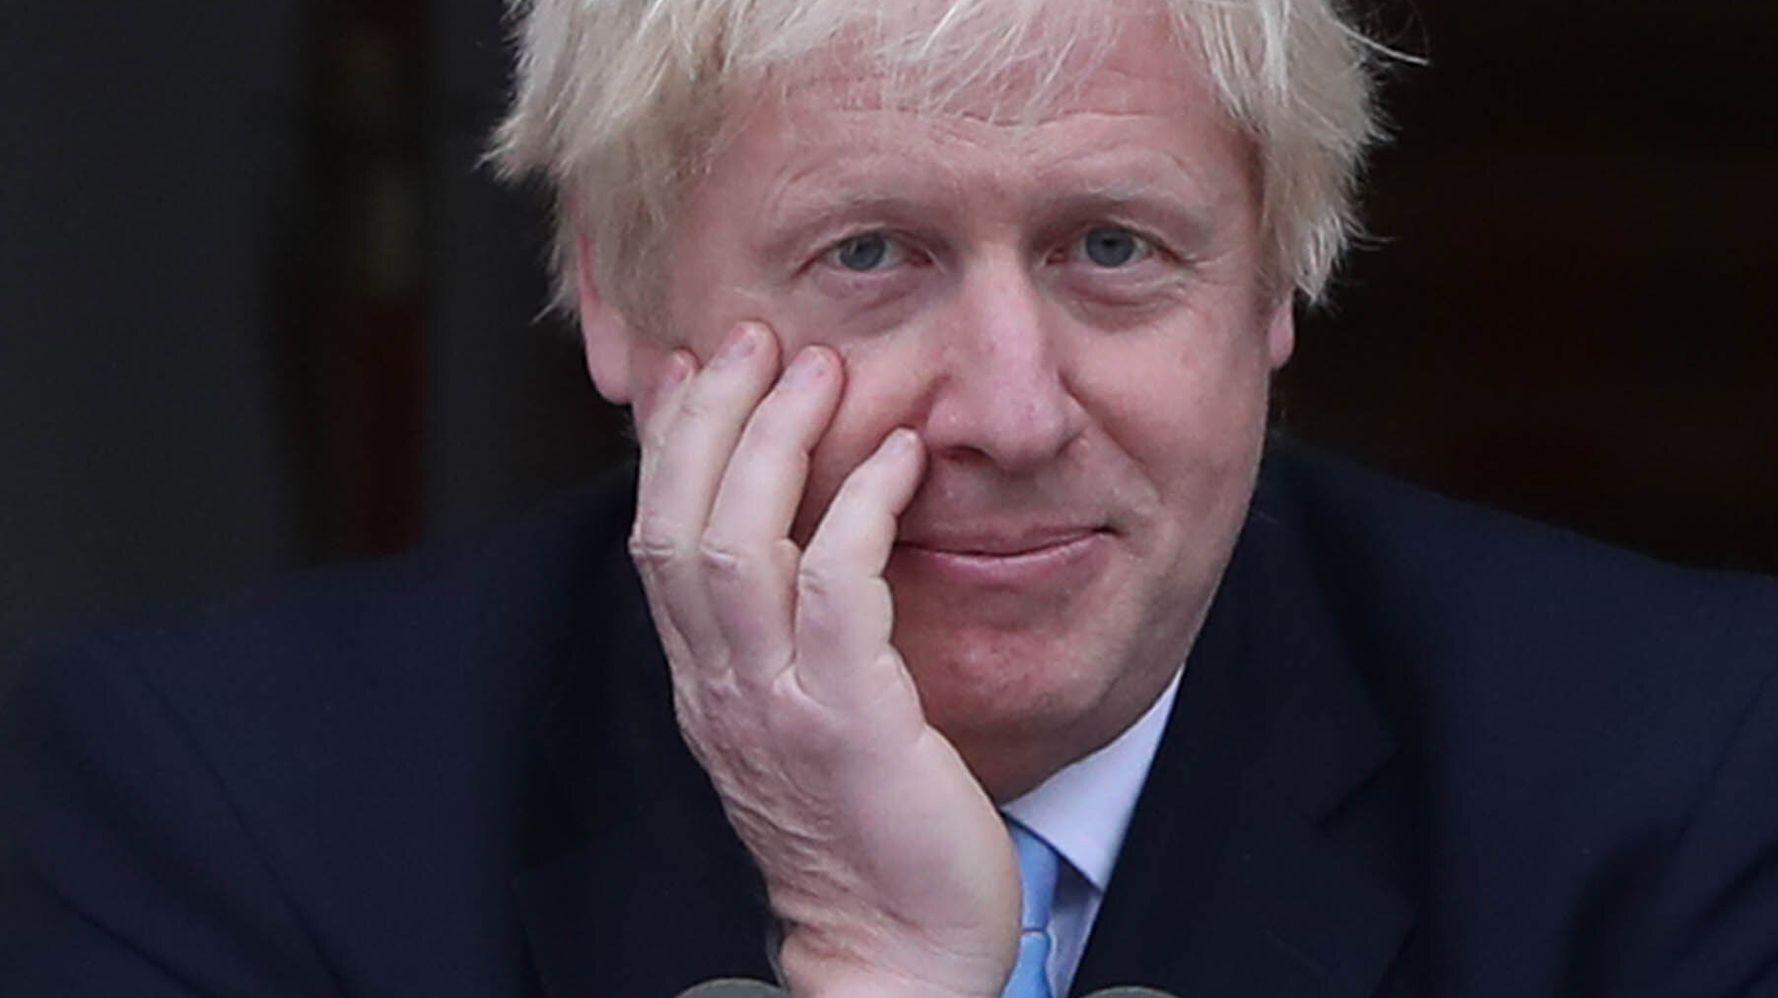 Westlake Legal Group 5d762ebc2300009f035128ce Parliament Will Be Suspended Tonight Even If Boris Johnson's Election Bid Fails